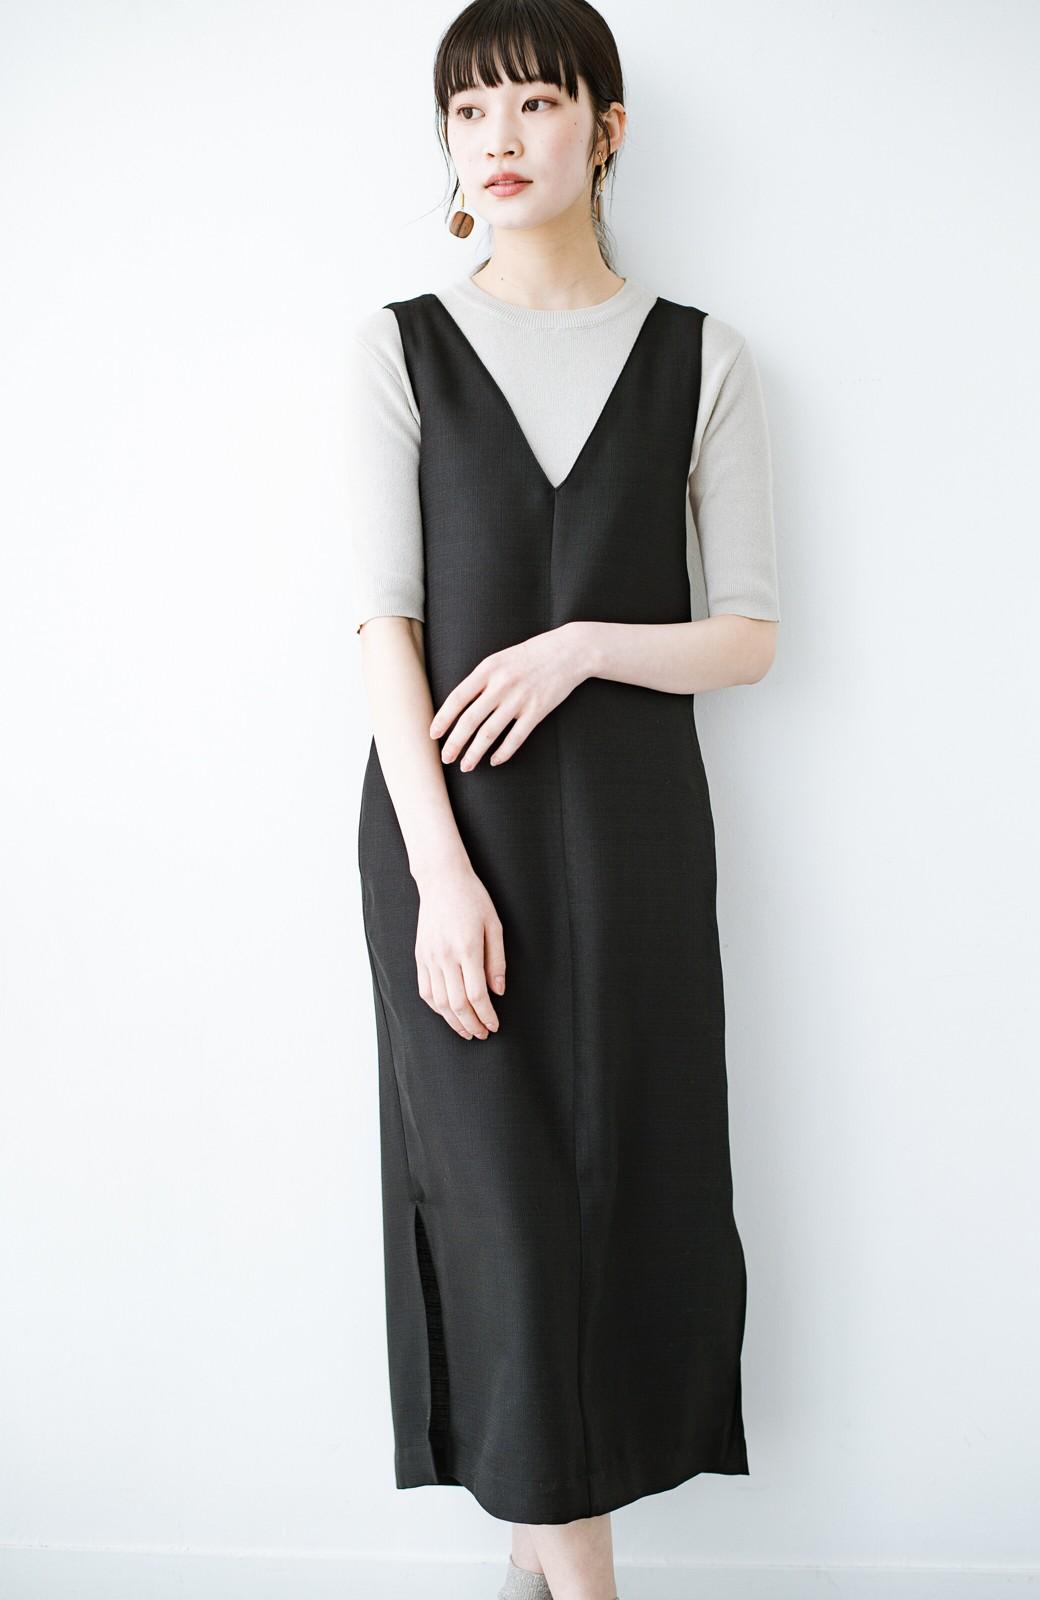 haco! 何てことないTシャツと重ねるだけでパッとかわいくなれる 魔法のようなジャンパースカート <ブラック>の商品写真1